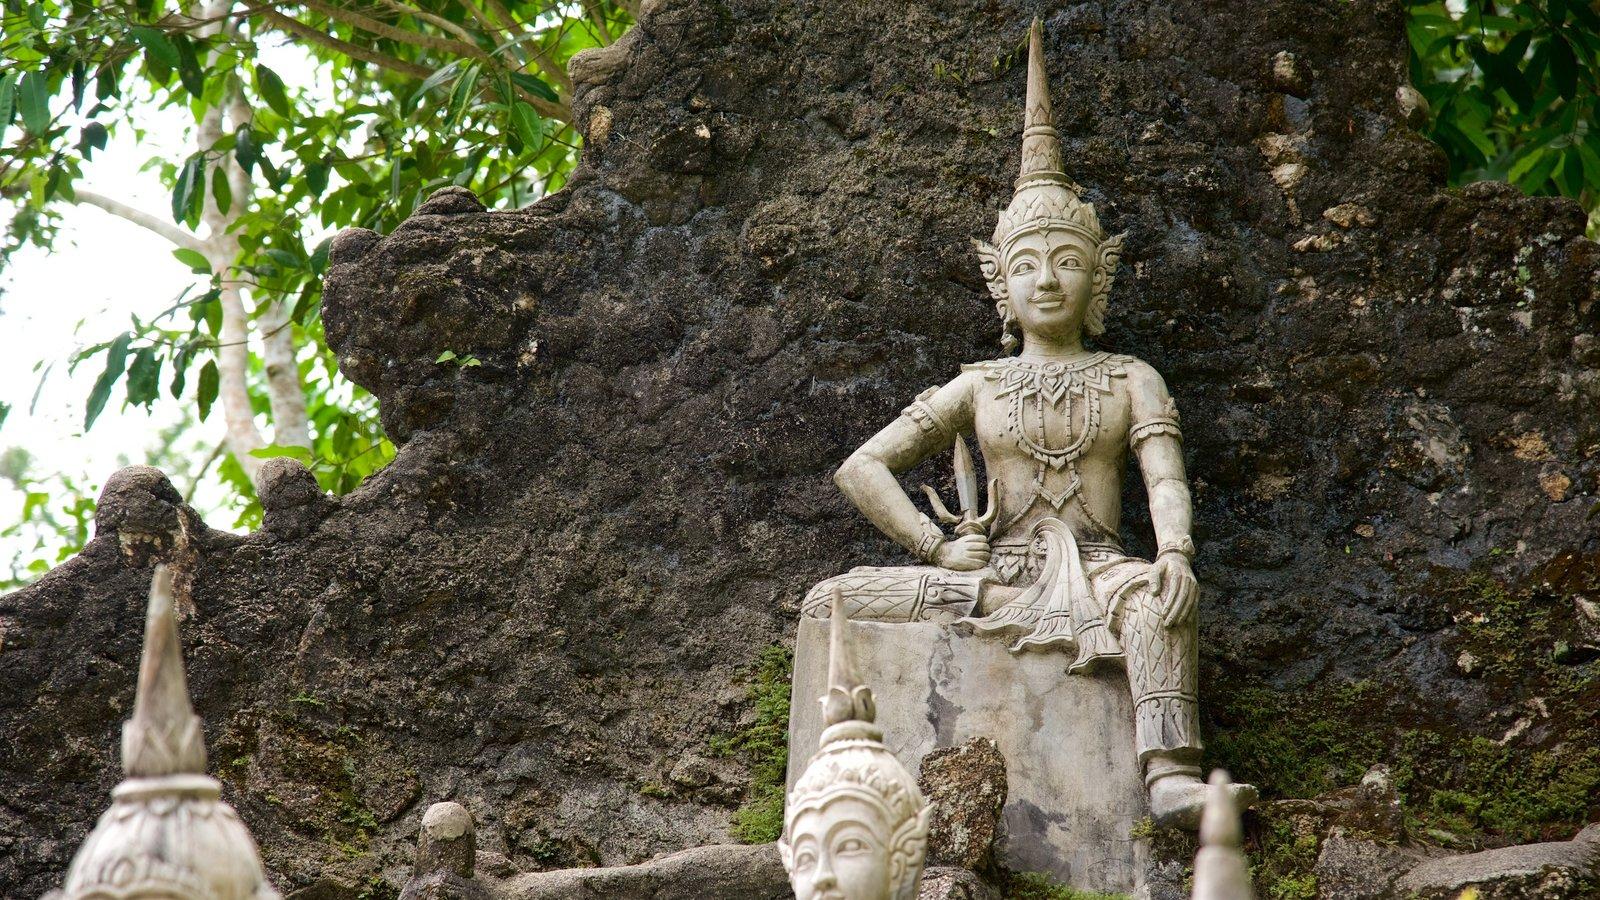 Secret Buddha Garden Which Includes A Statue Or Sculpture And A Garden